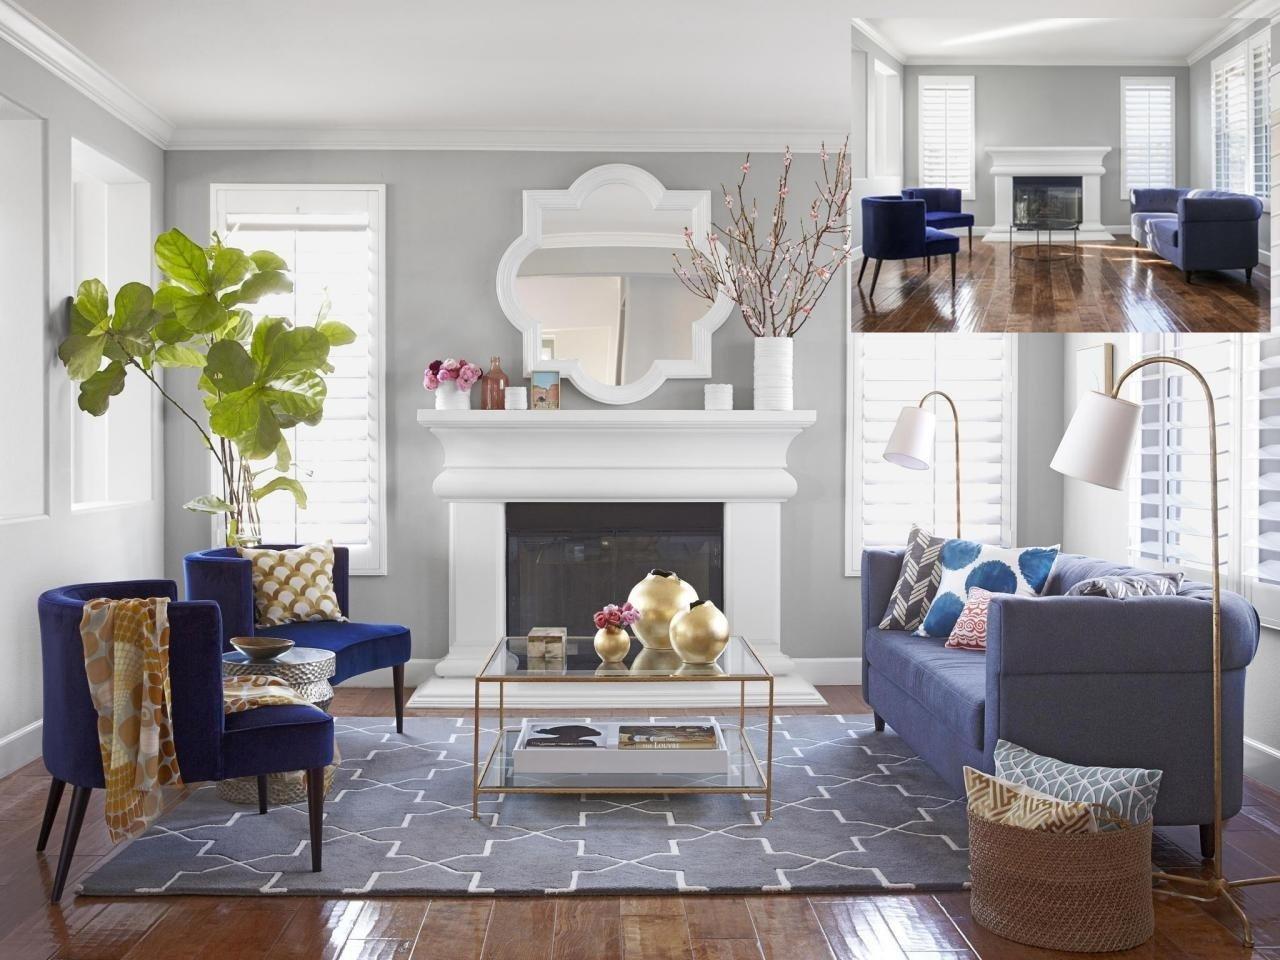 10 Stylish Hgtv Living Room Decorating Ideas hgtv living rooms luxury a mother s day living room makeover 2021